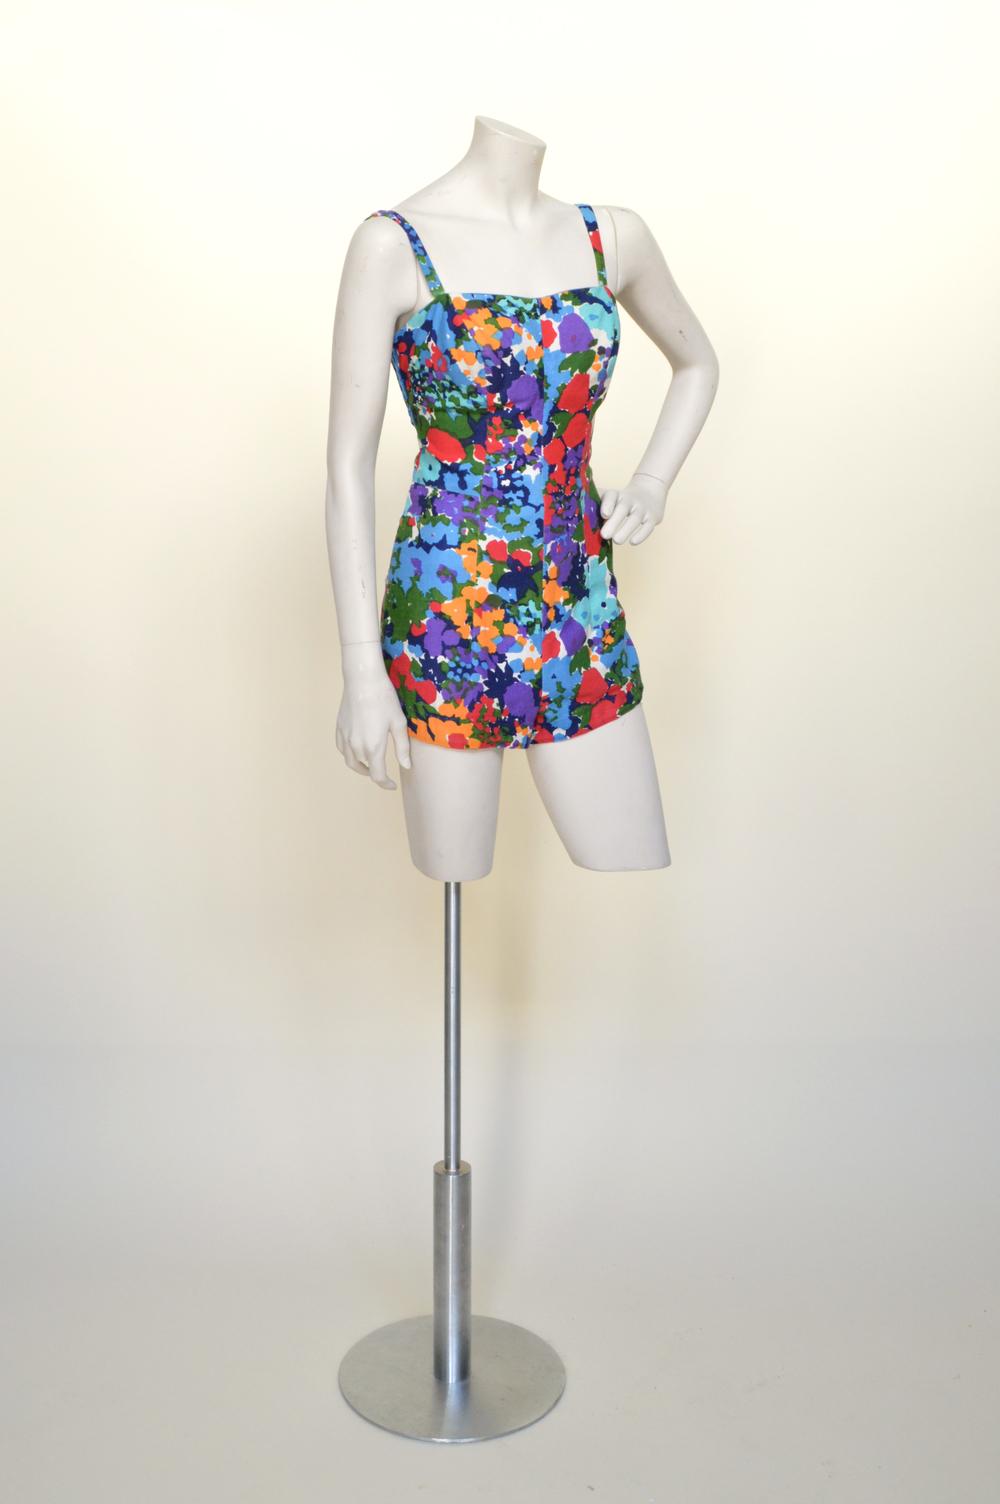 Vintage maillot from Dalena Vintage